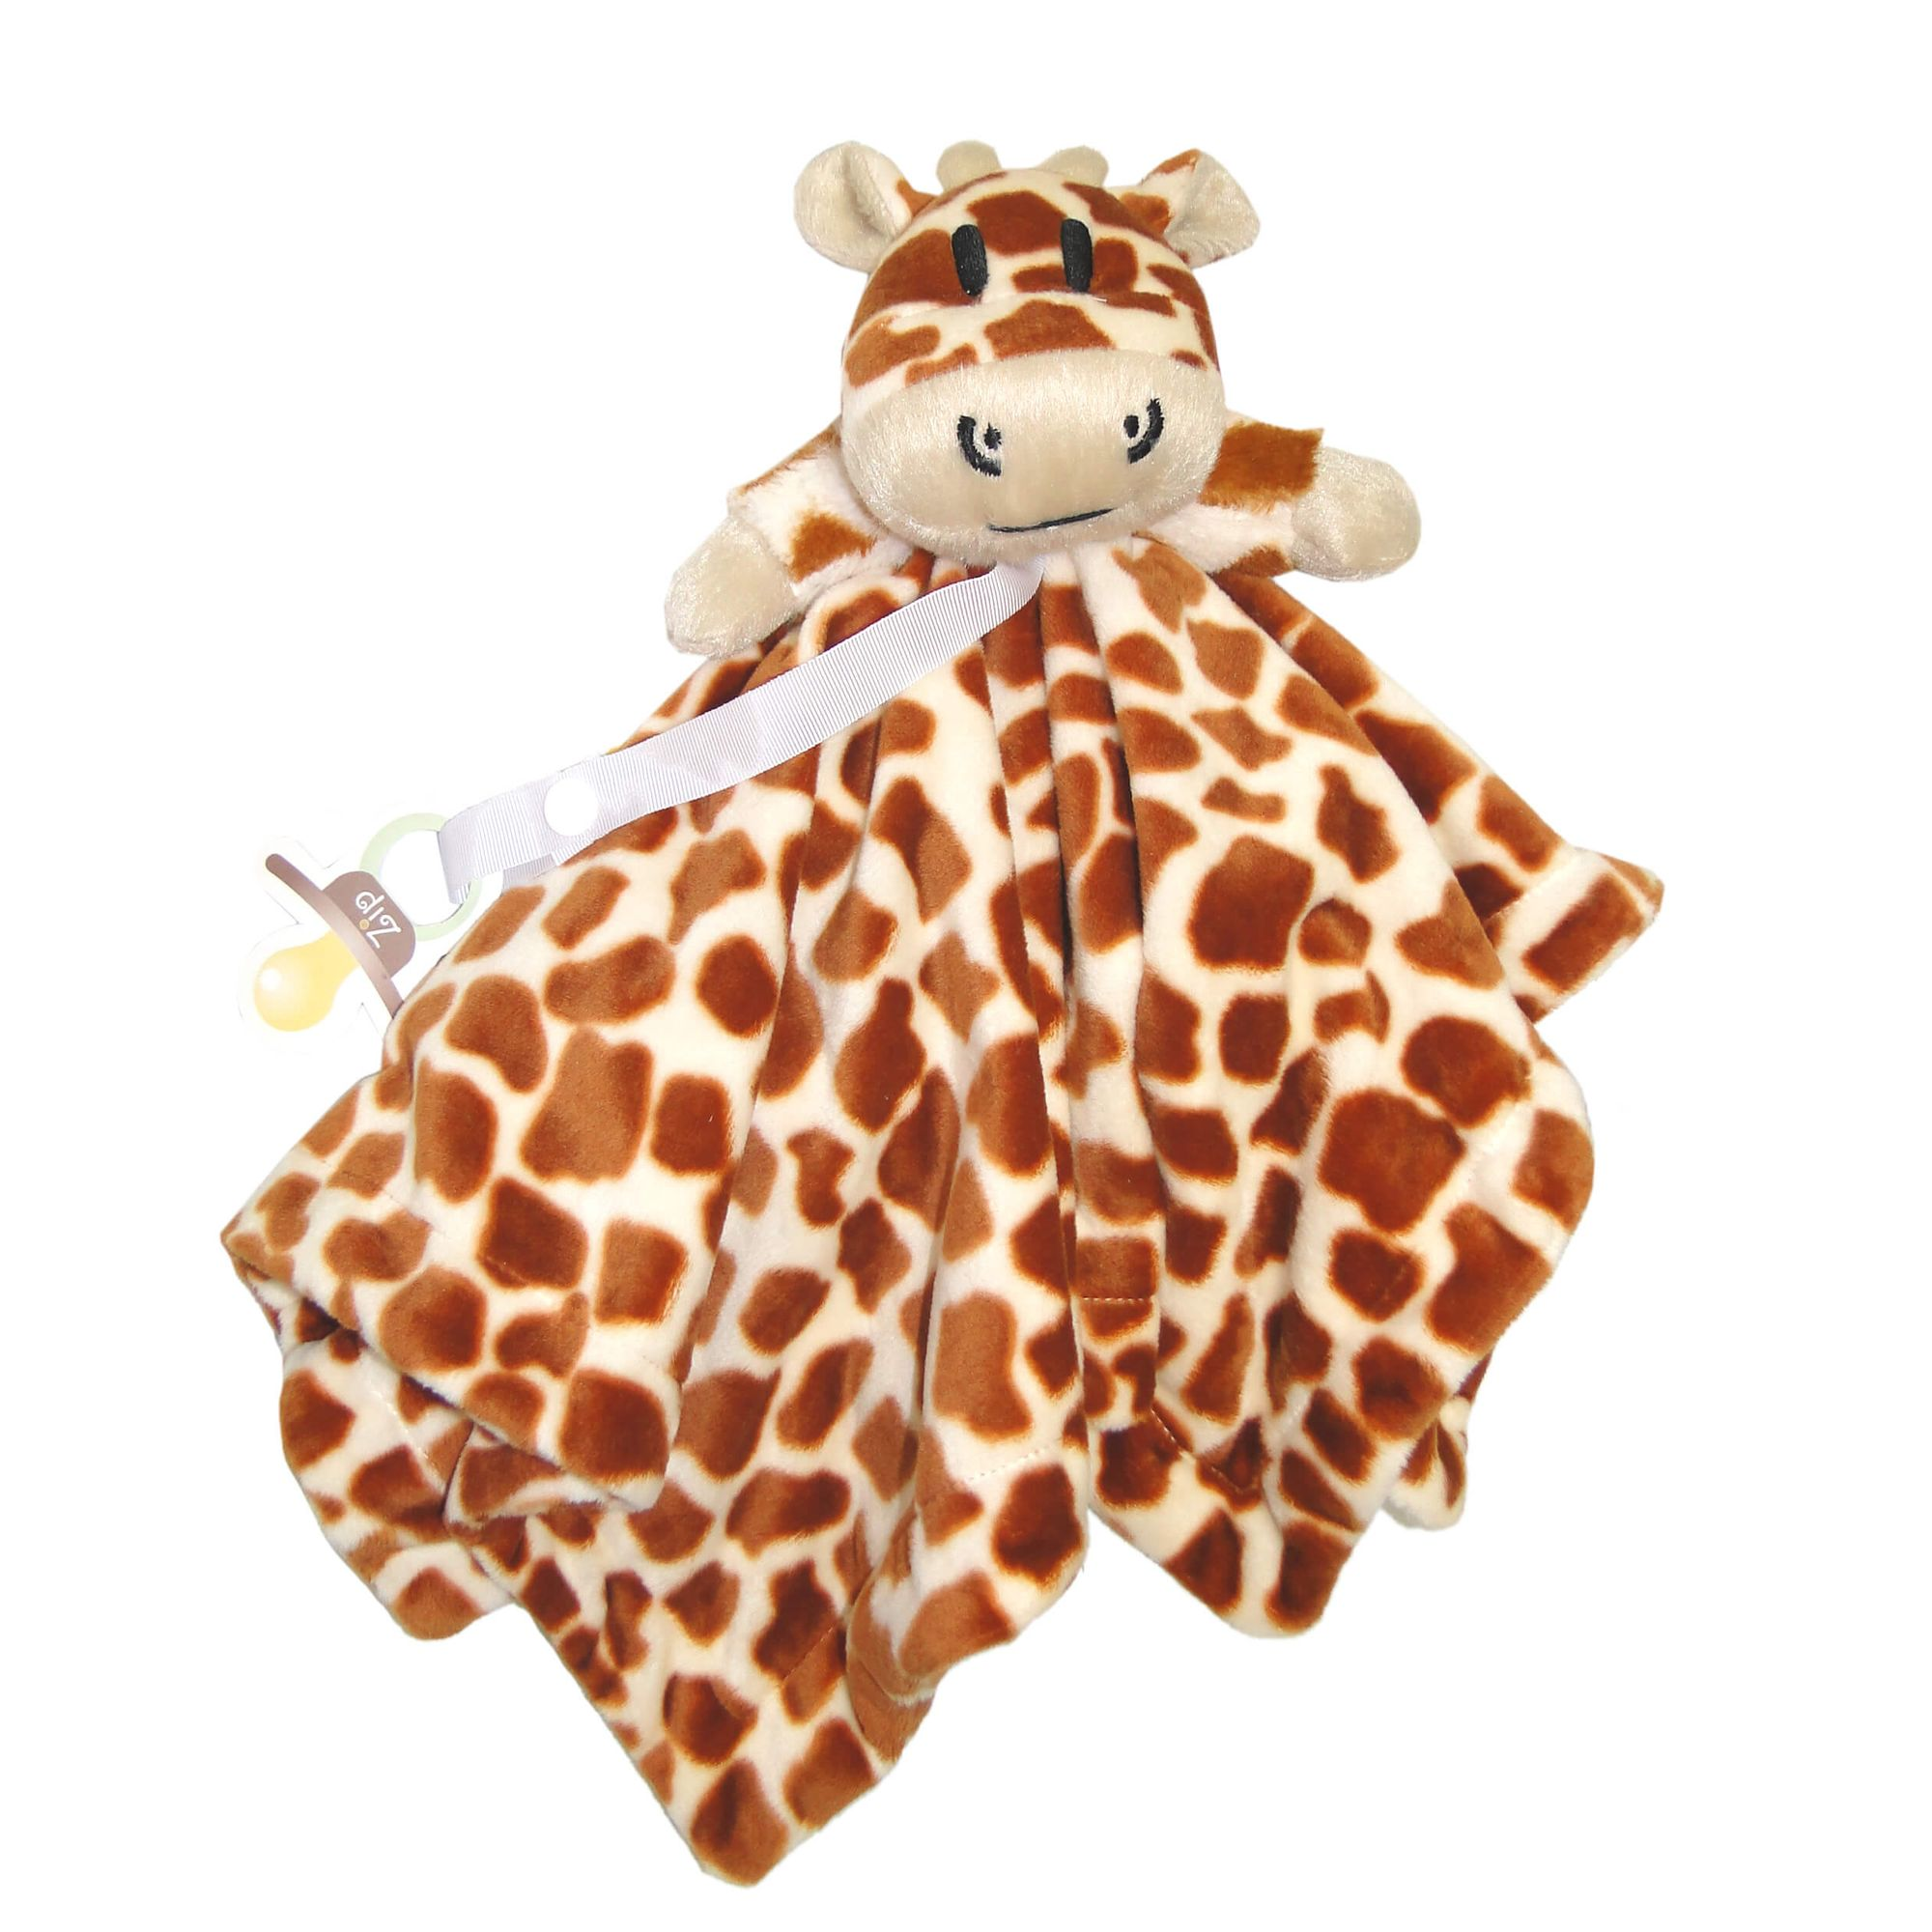 blanket-pelucia-girafinha-carinhas-ziptoys